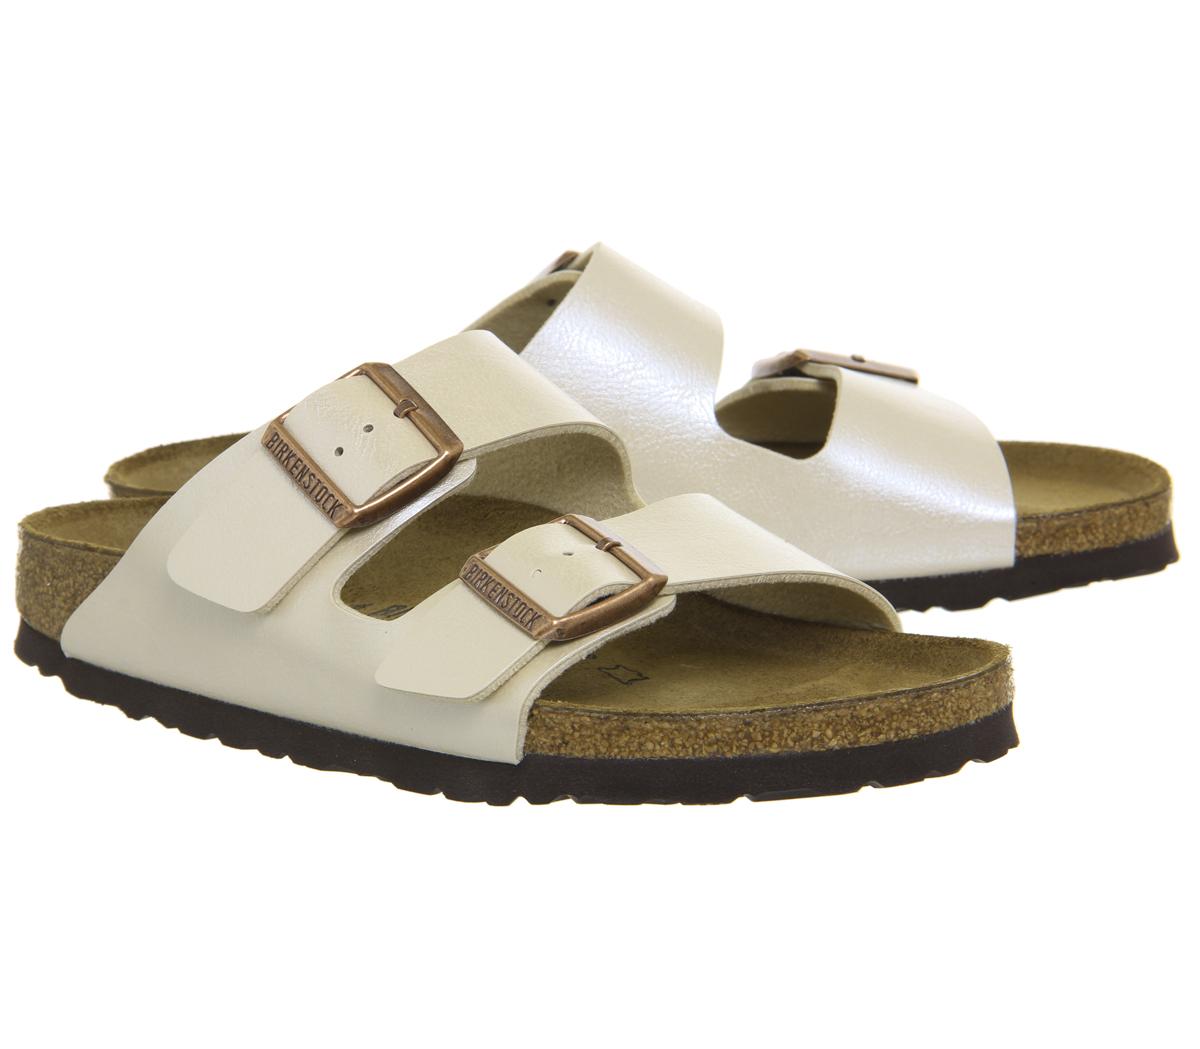 347a7bae7b0 Sentinel Womens Birkenstock Arizona Two Strap Sandals Graceful Pearl White  Sandals